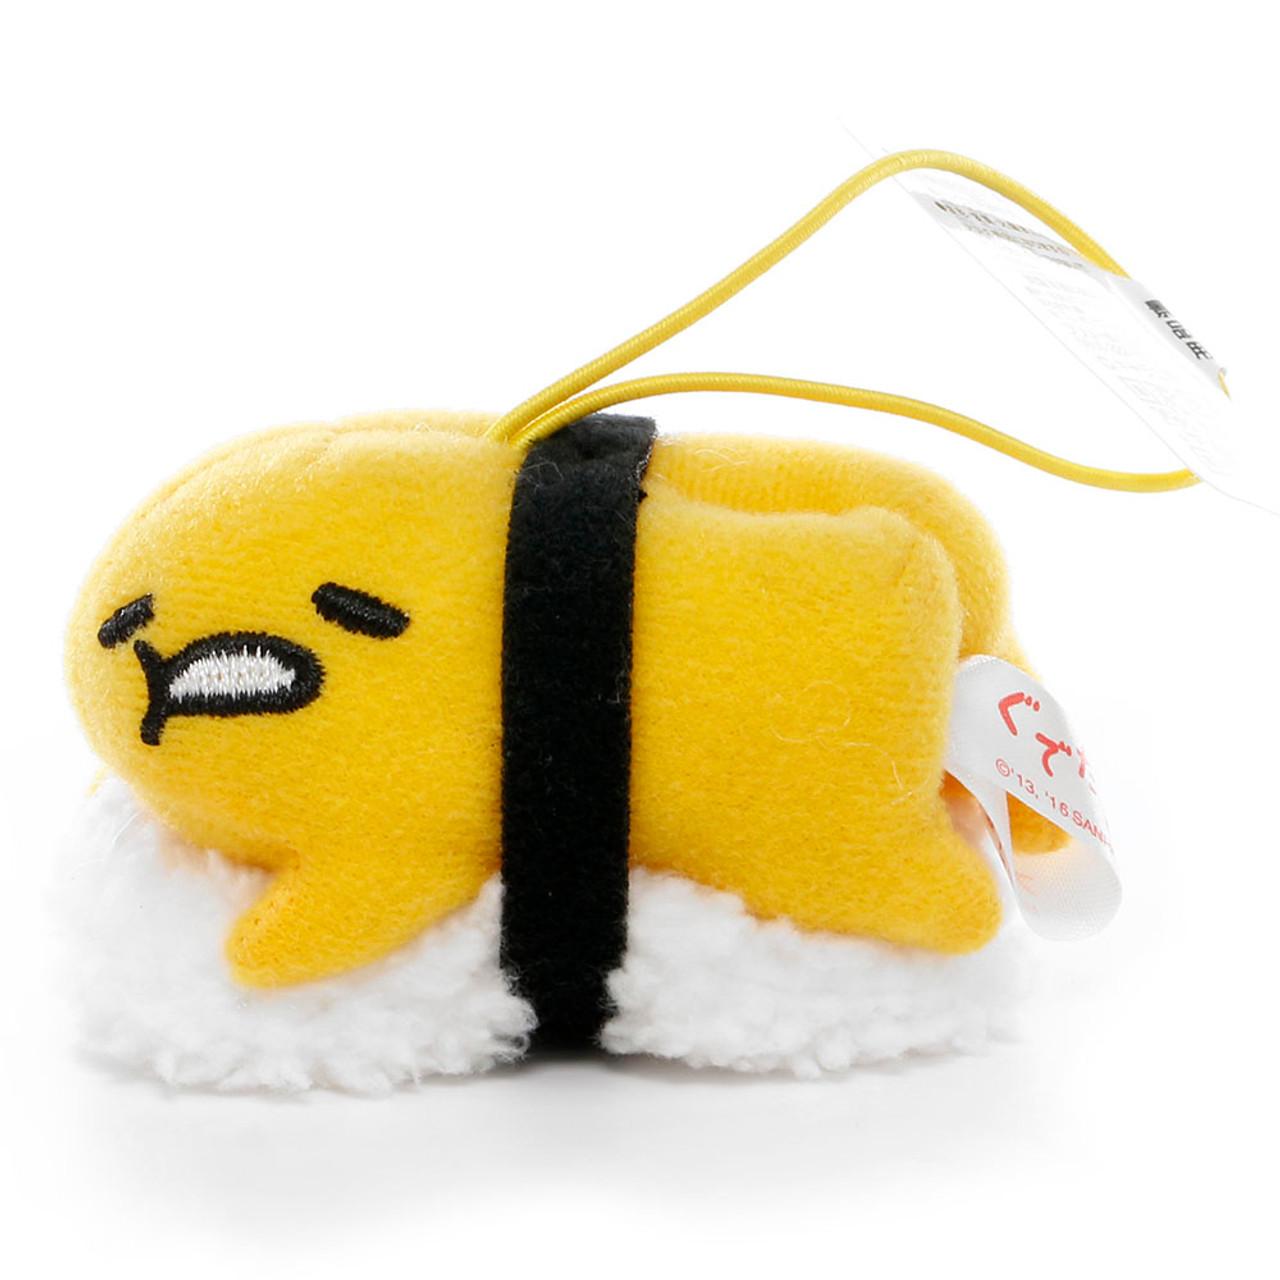 Sanrio Gudetama Lazy Egg Sushi Mascot Plush Charms - Yolk Sushi ( Front View )